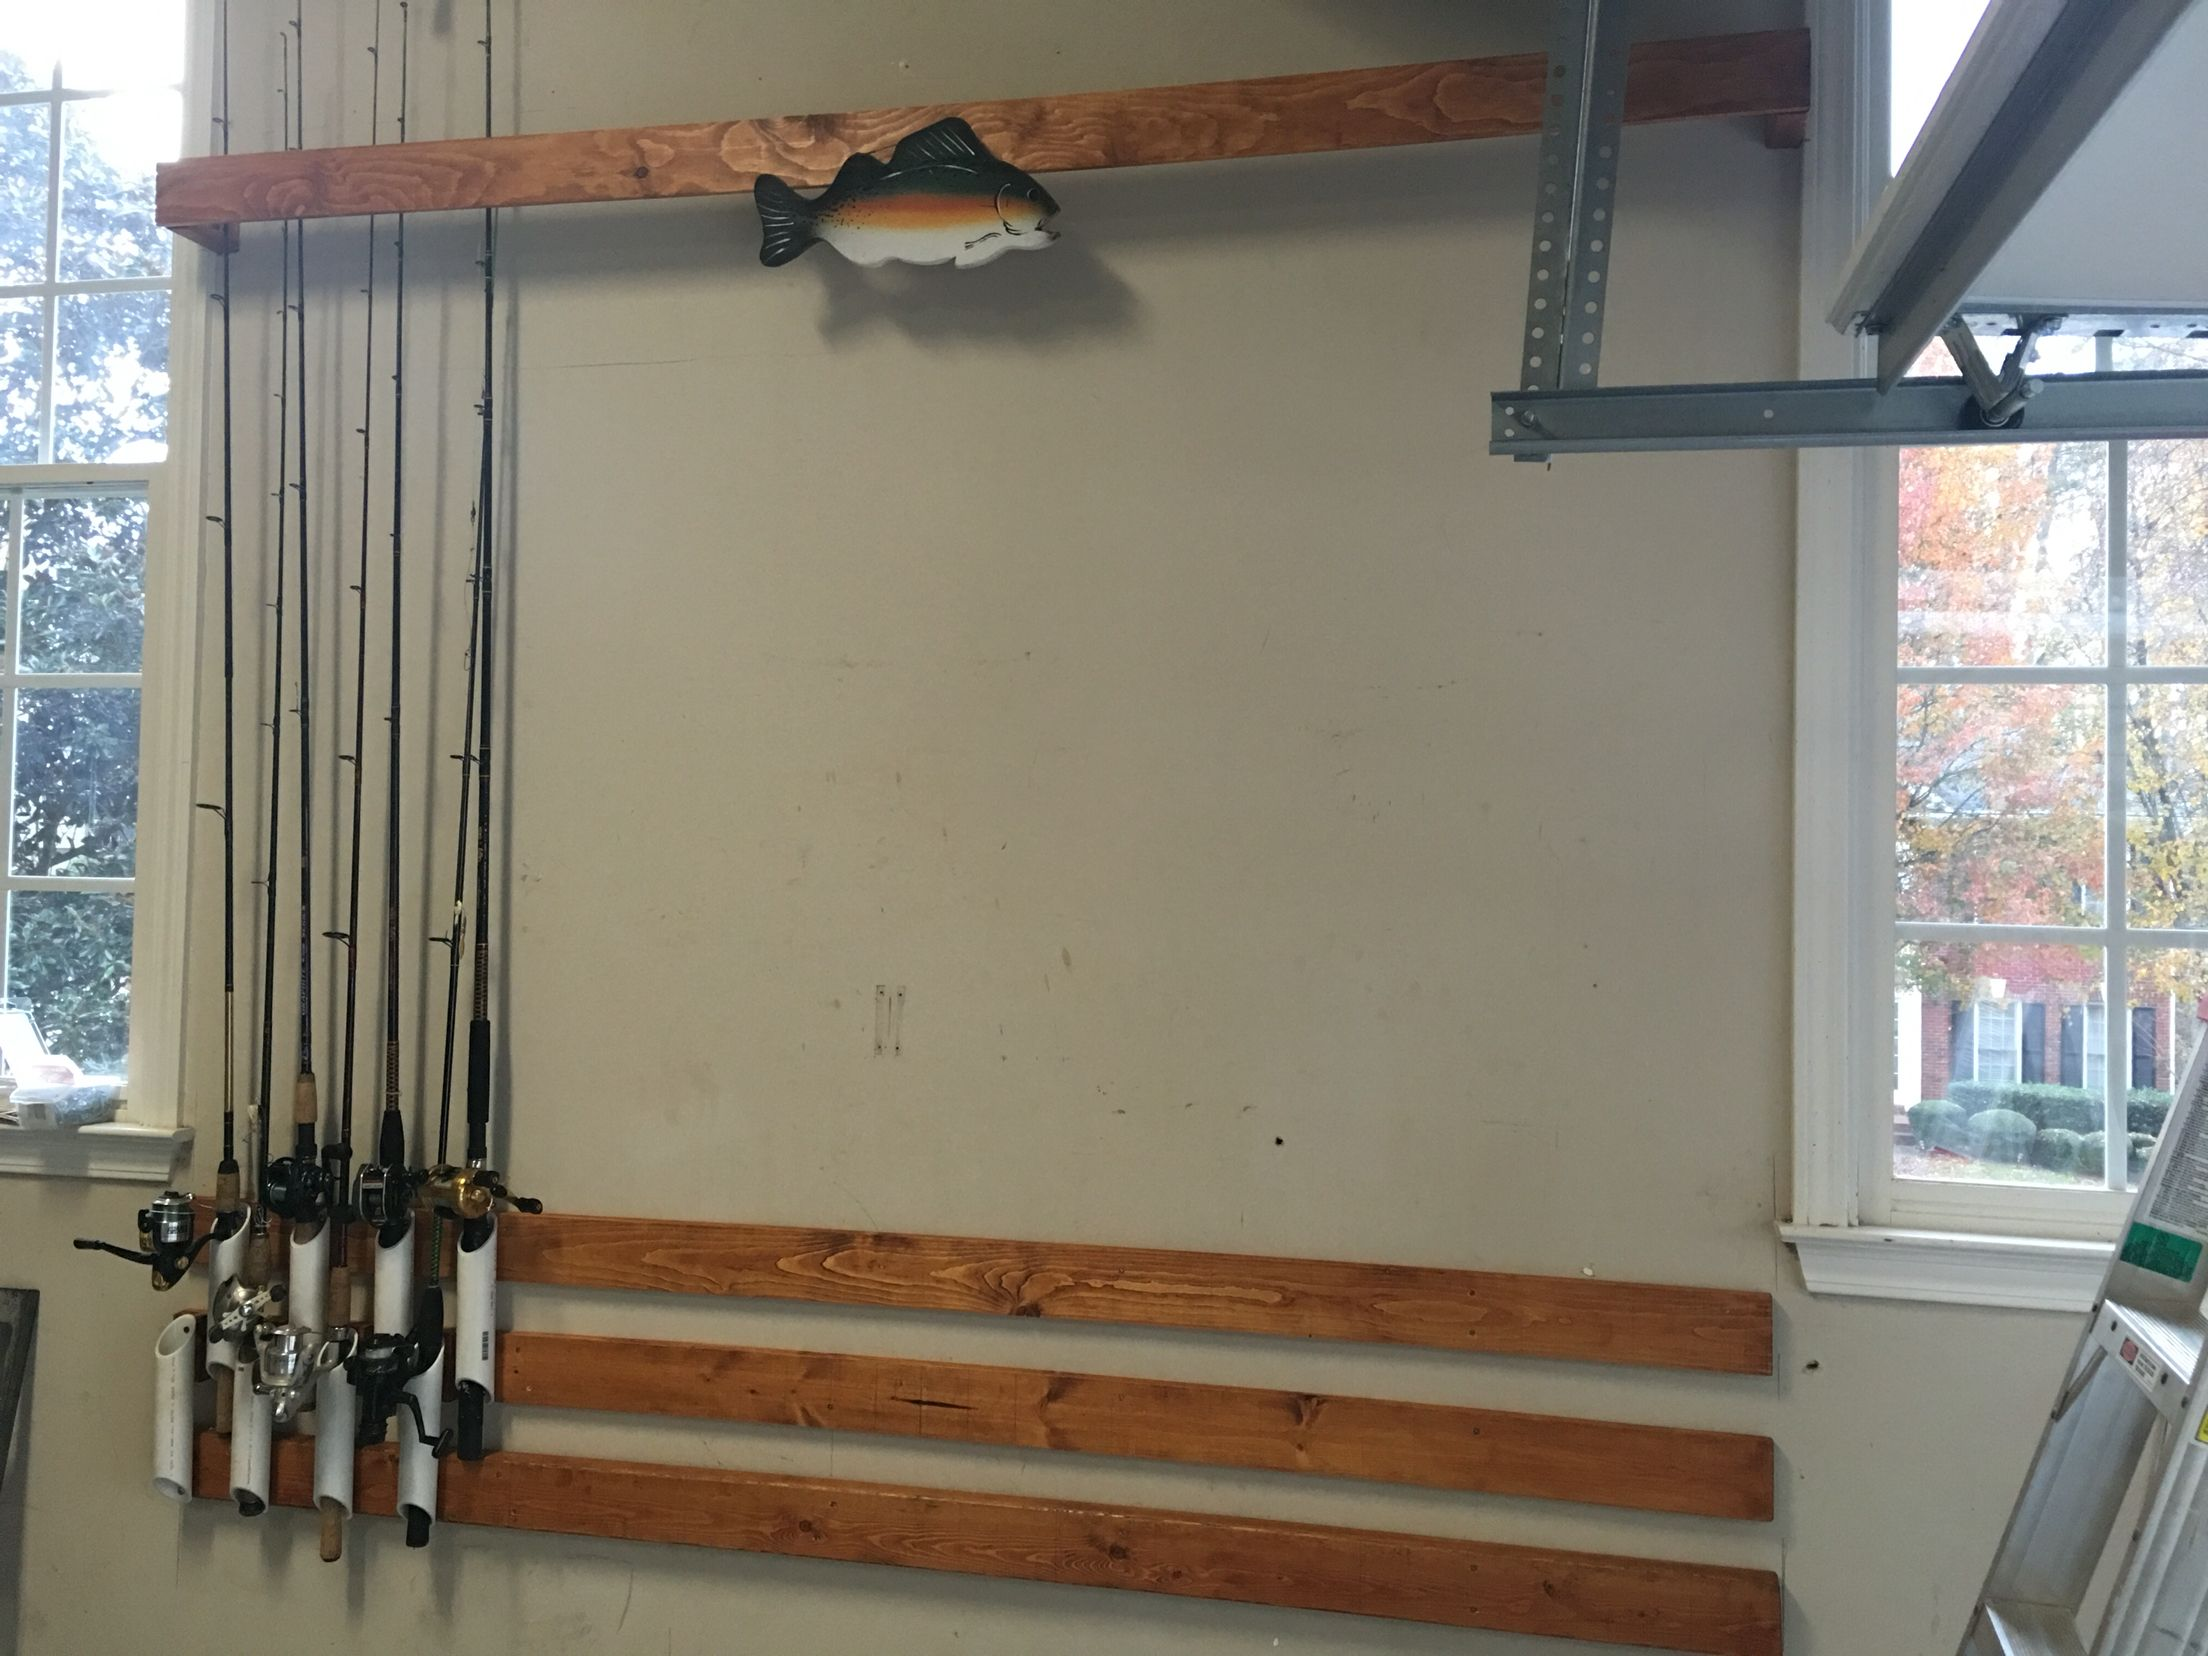 Fishing Pole Storage!